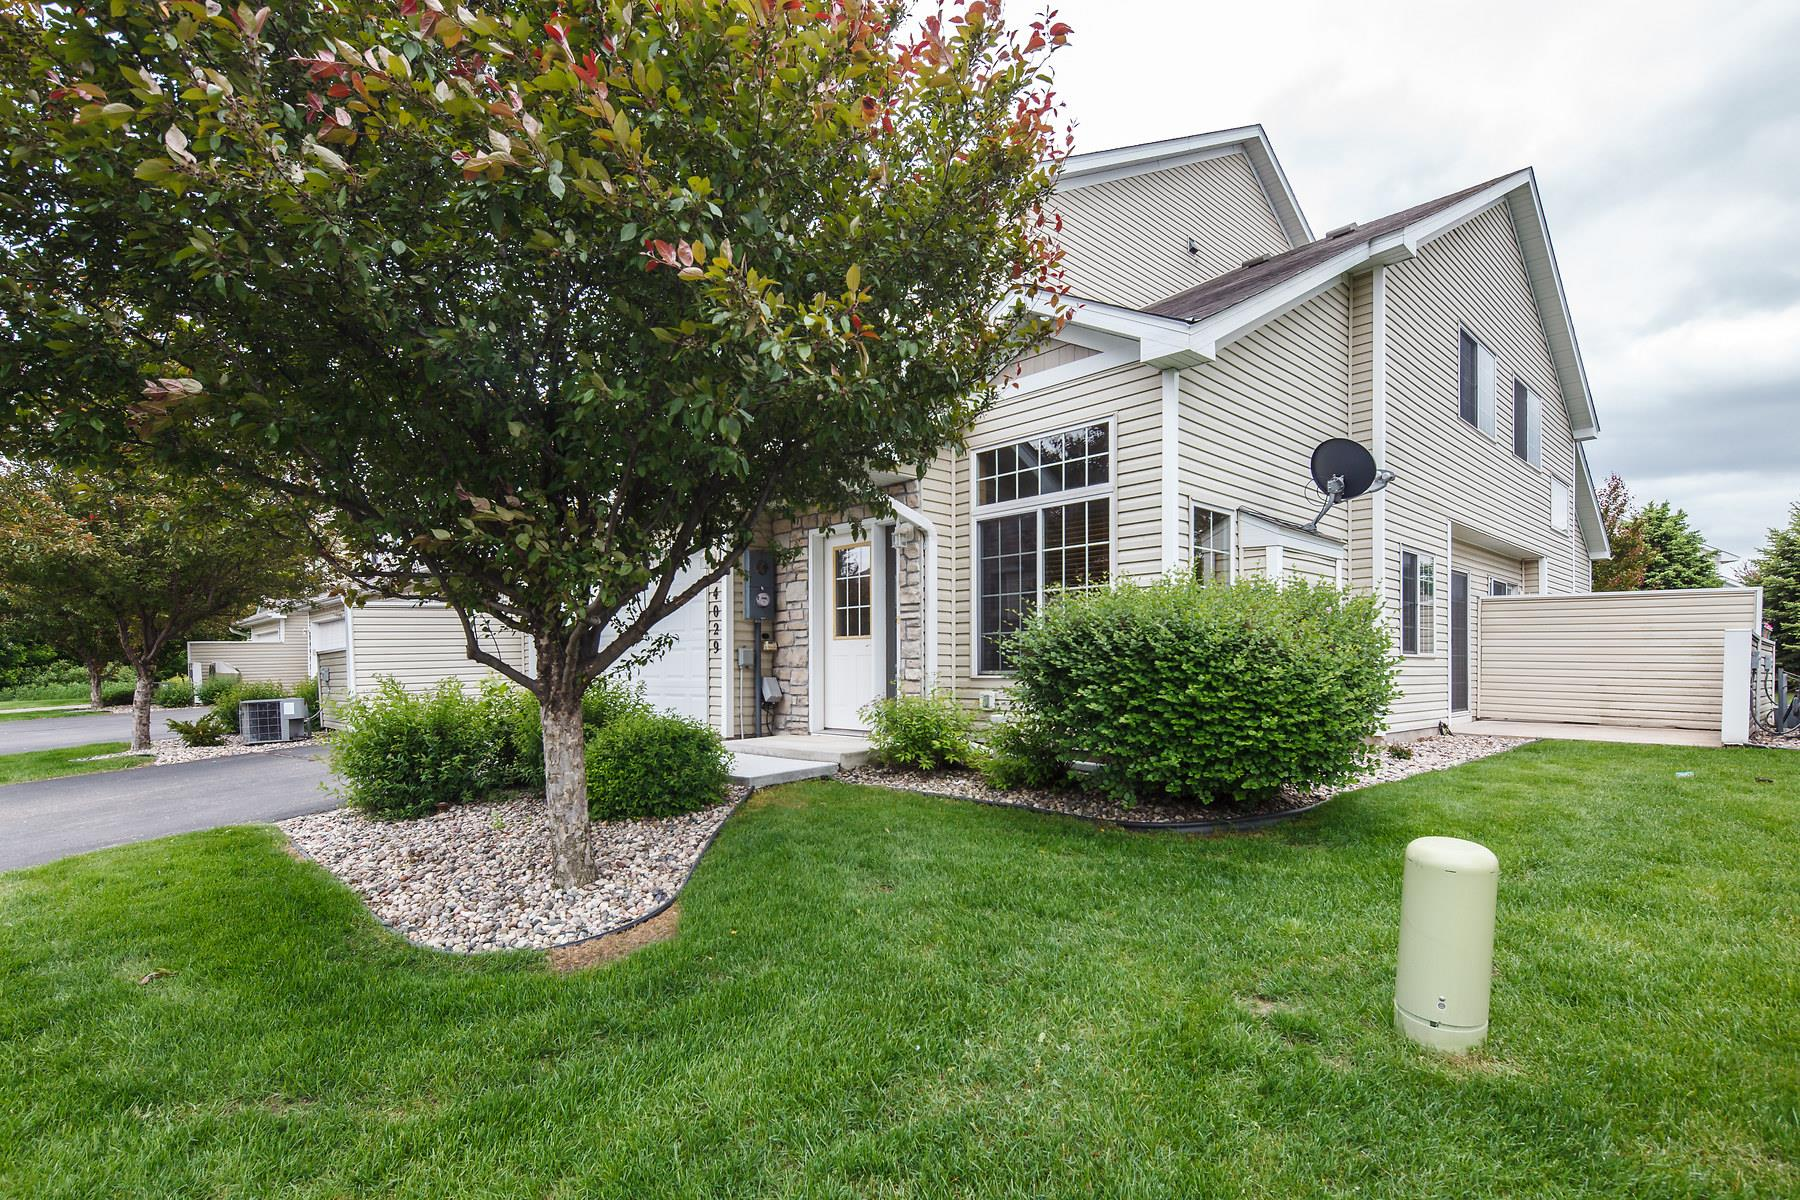 Single Family Home for Sale at 14029 Alabama Avenue S Savage, Minnesota, 55378 United States